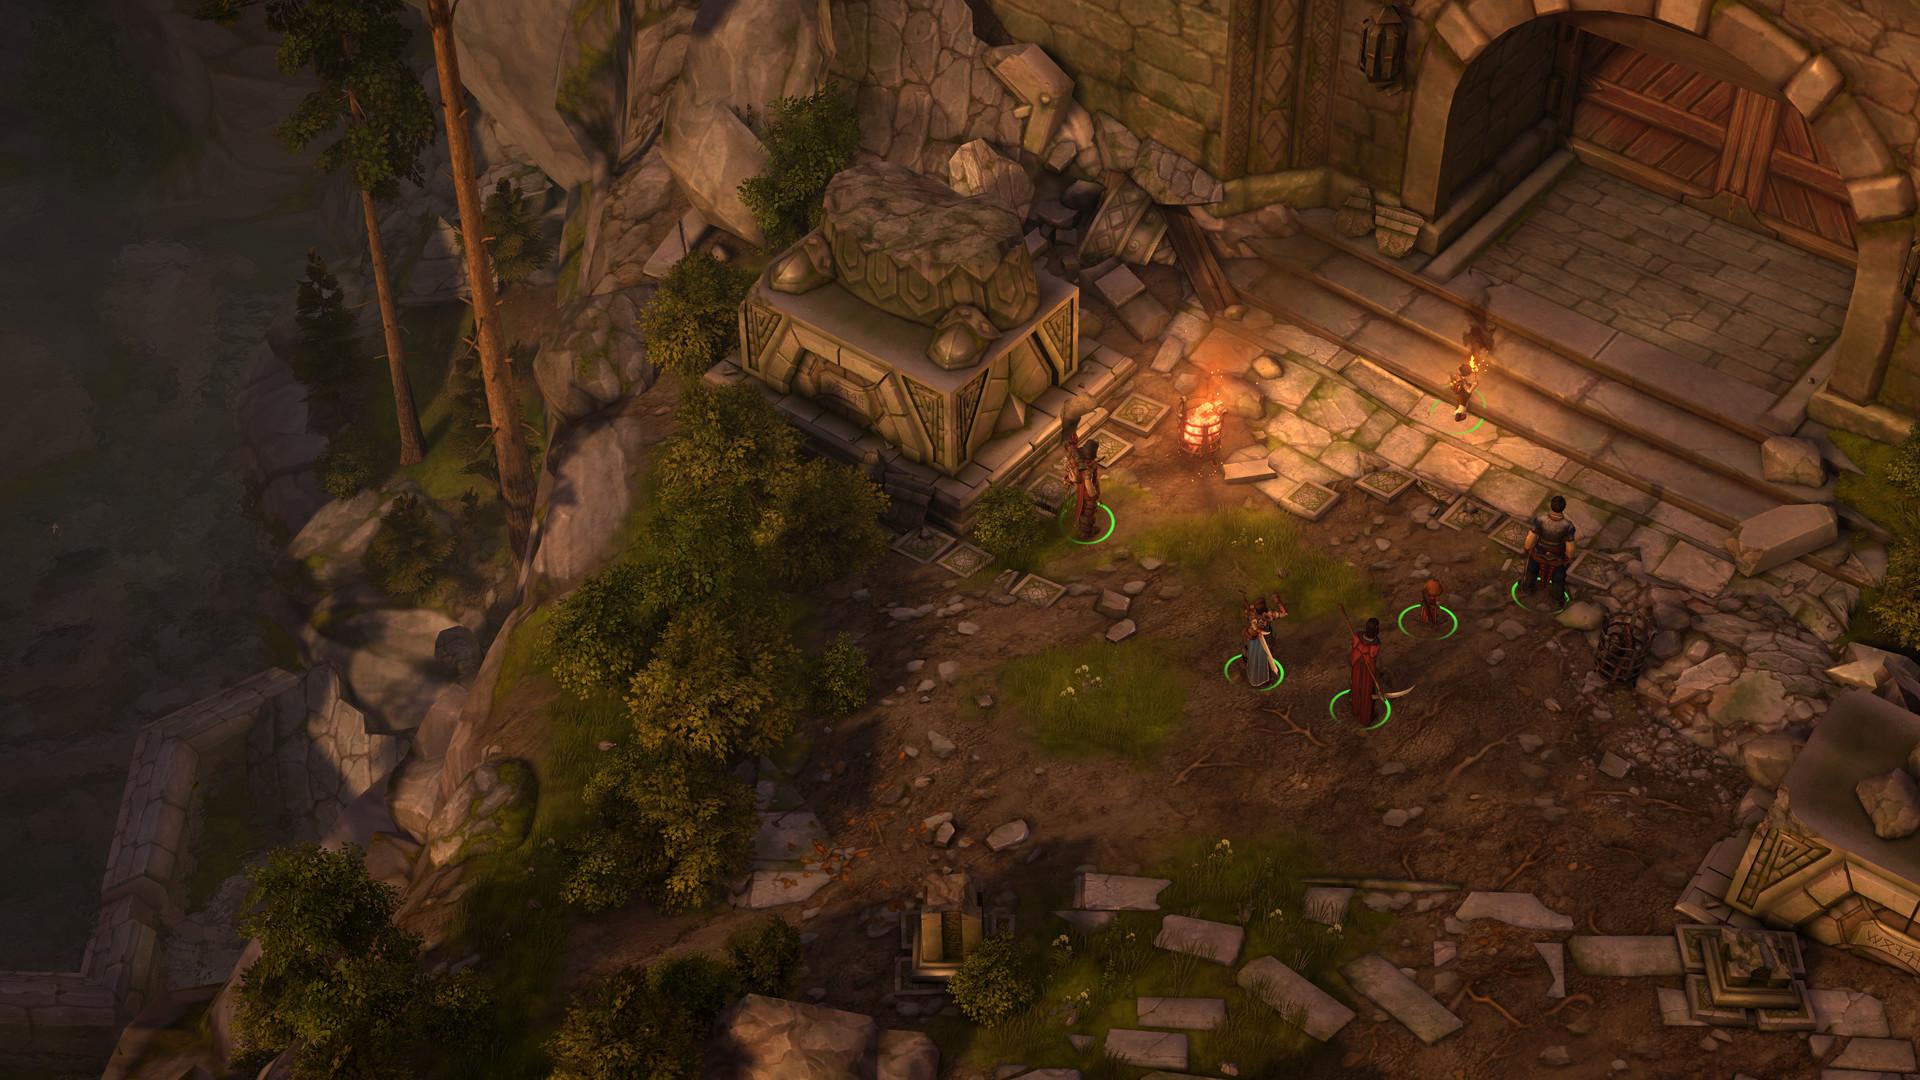 Pathfinder Kingmaker Beneath the Stolen Lands Update v2 0 7-CODEX Torrent Free Download